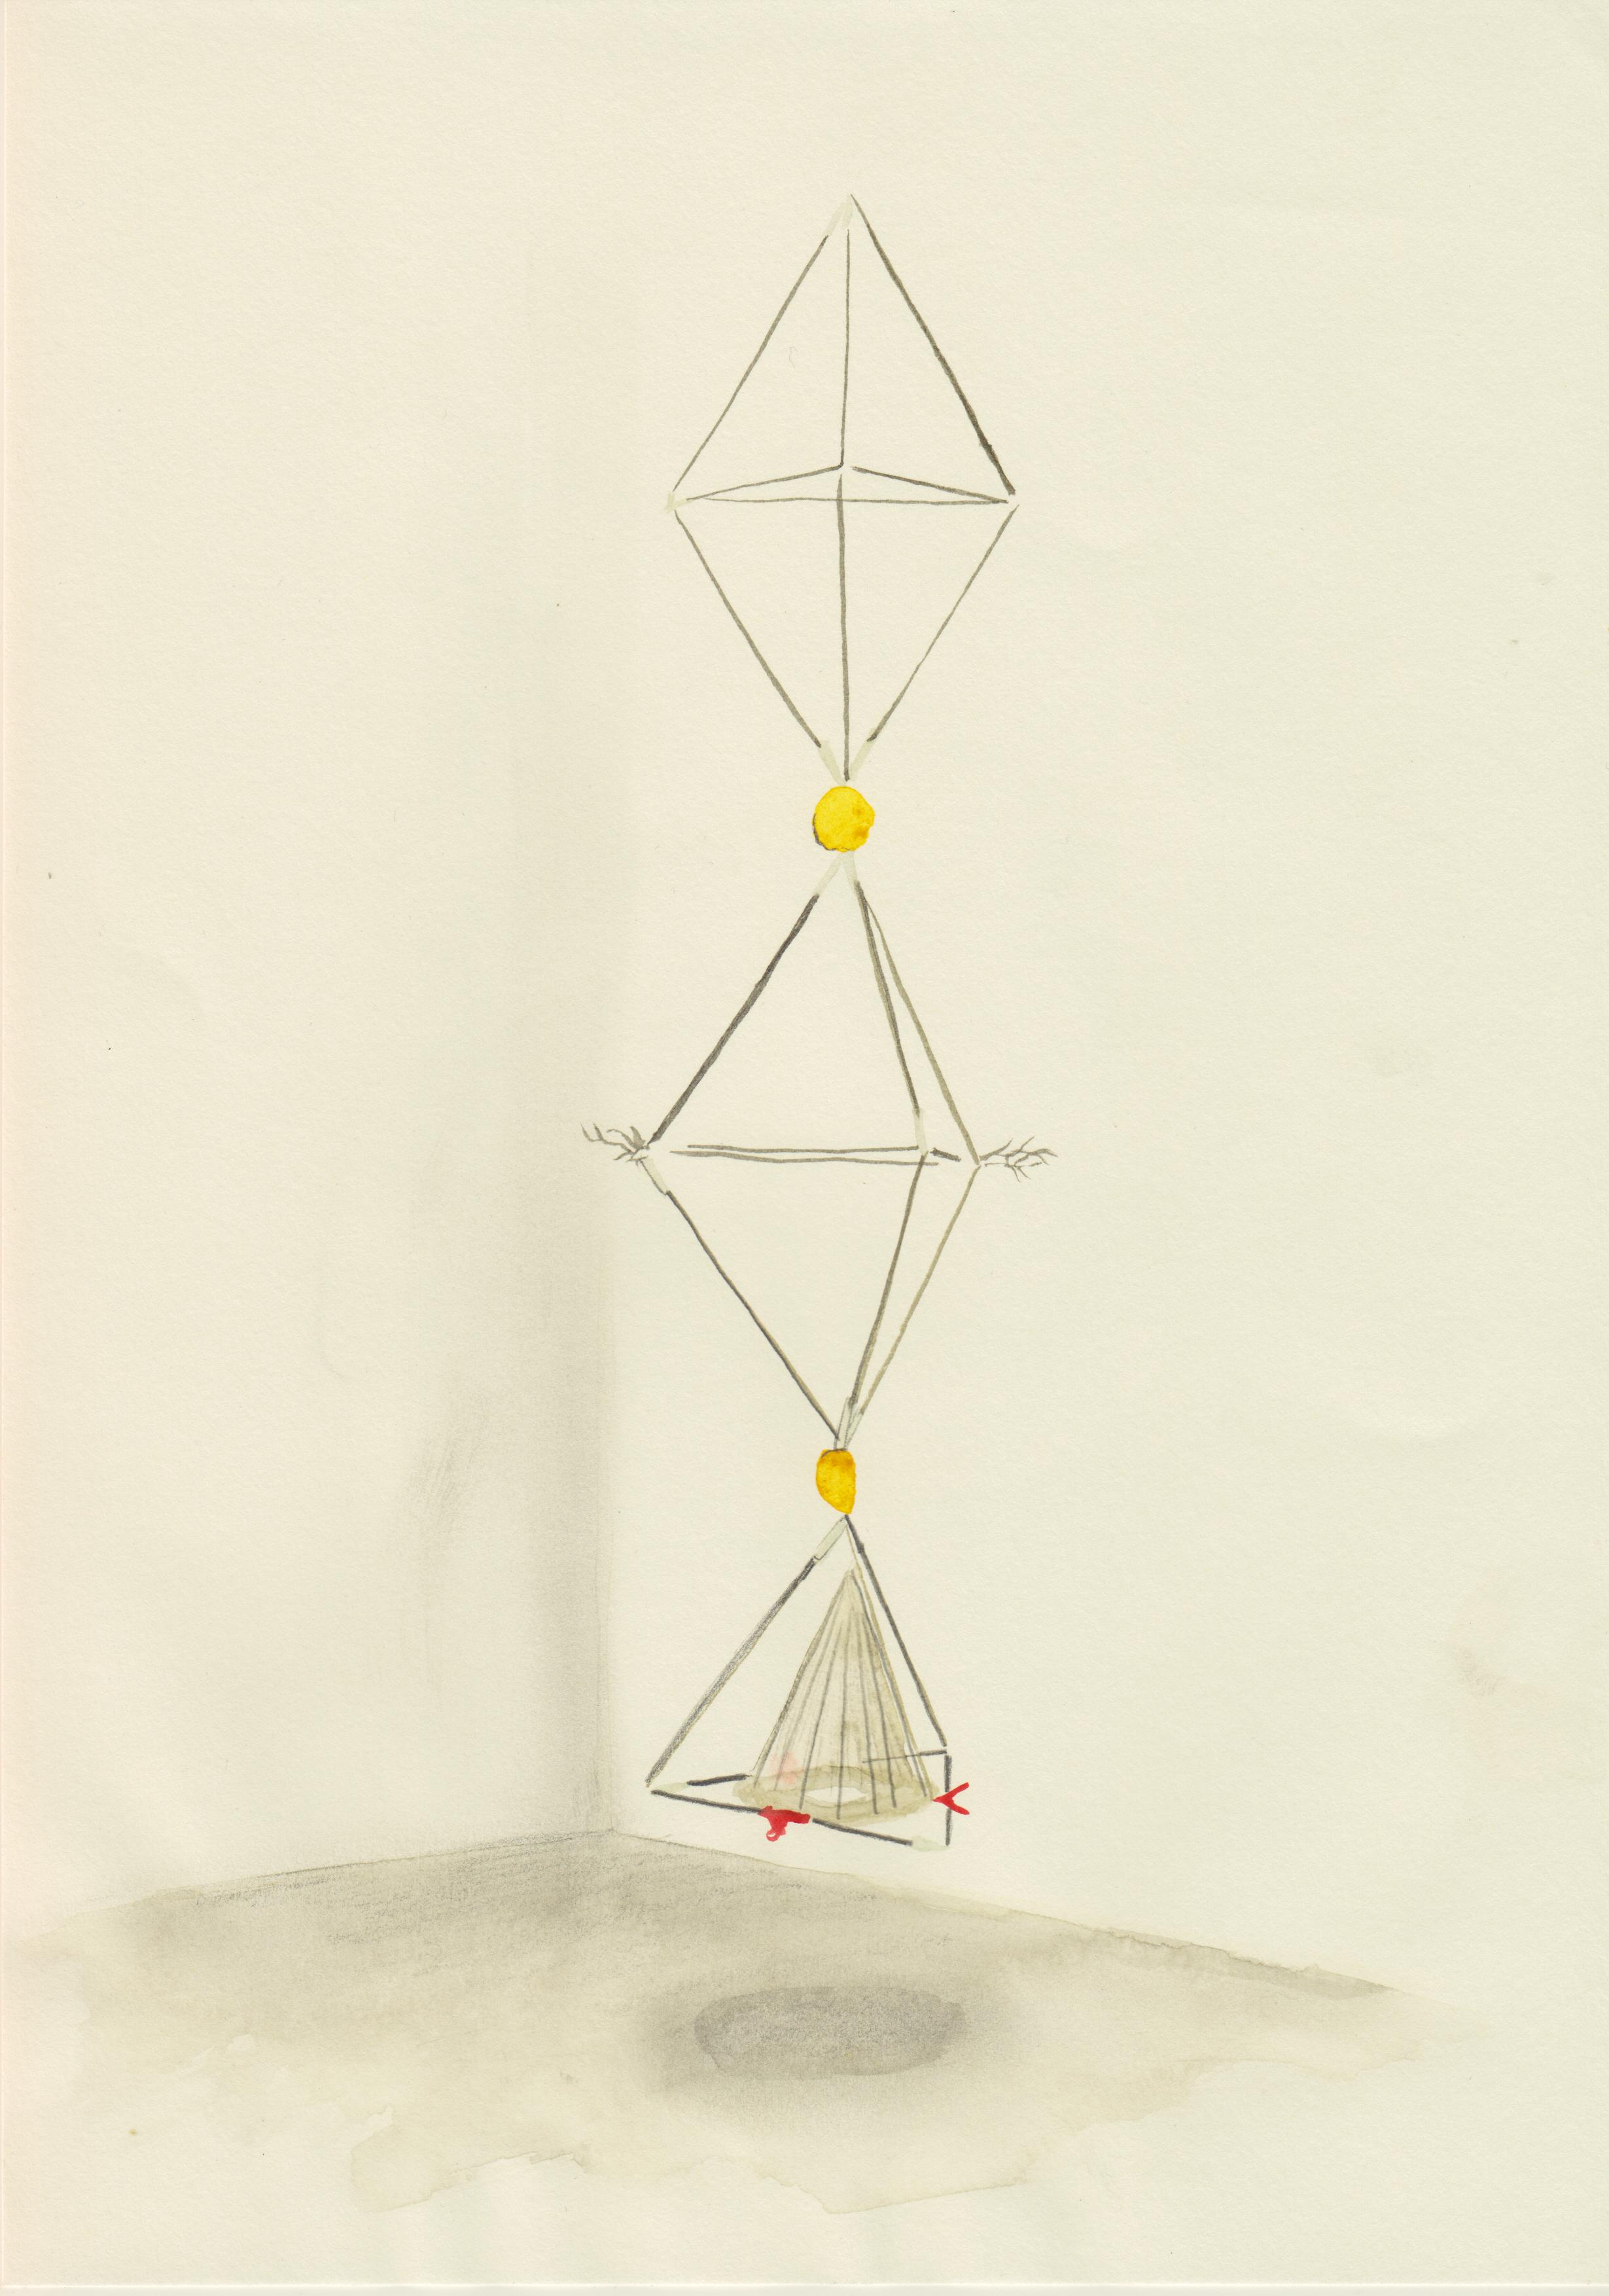 tetrahedron column study, 2019